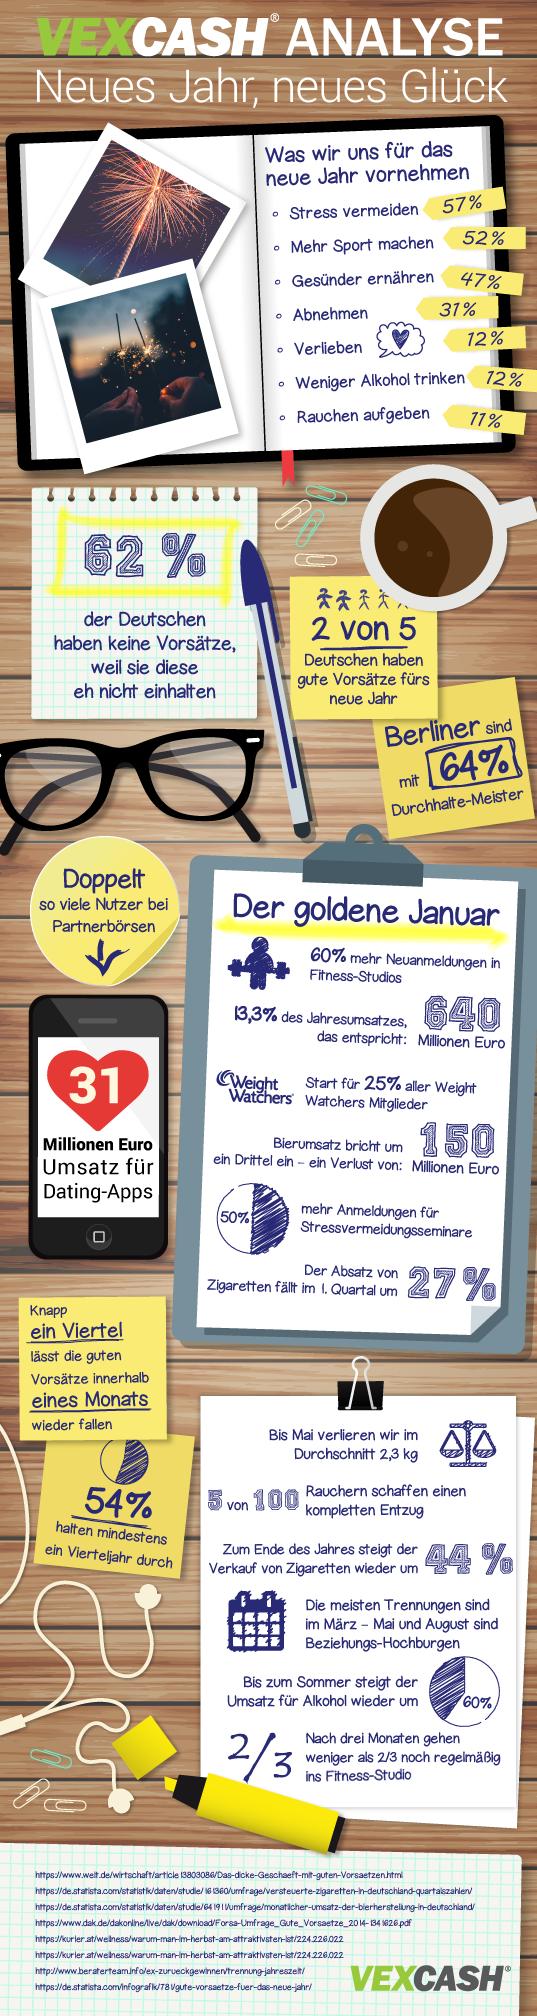 Vexcash Infografik: Silvester